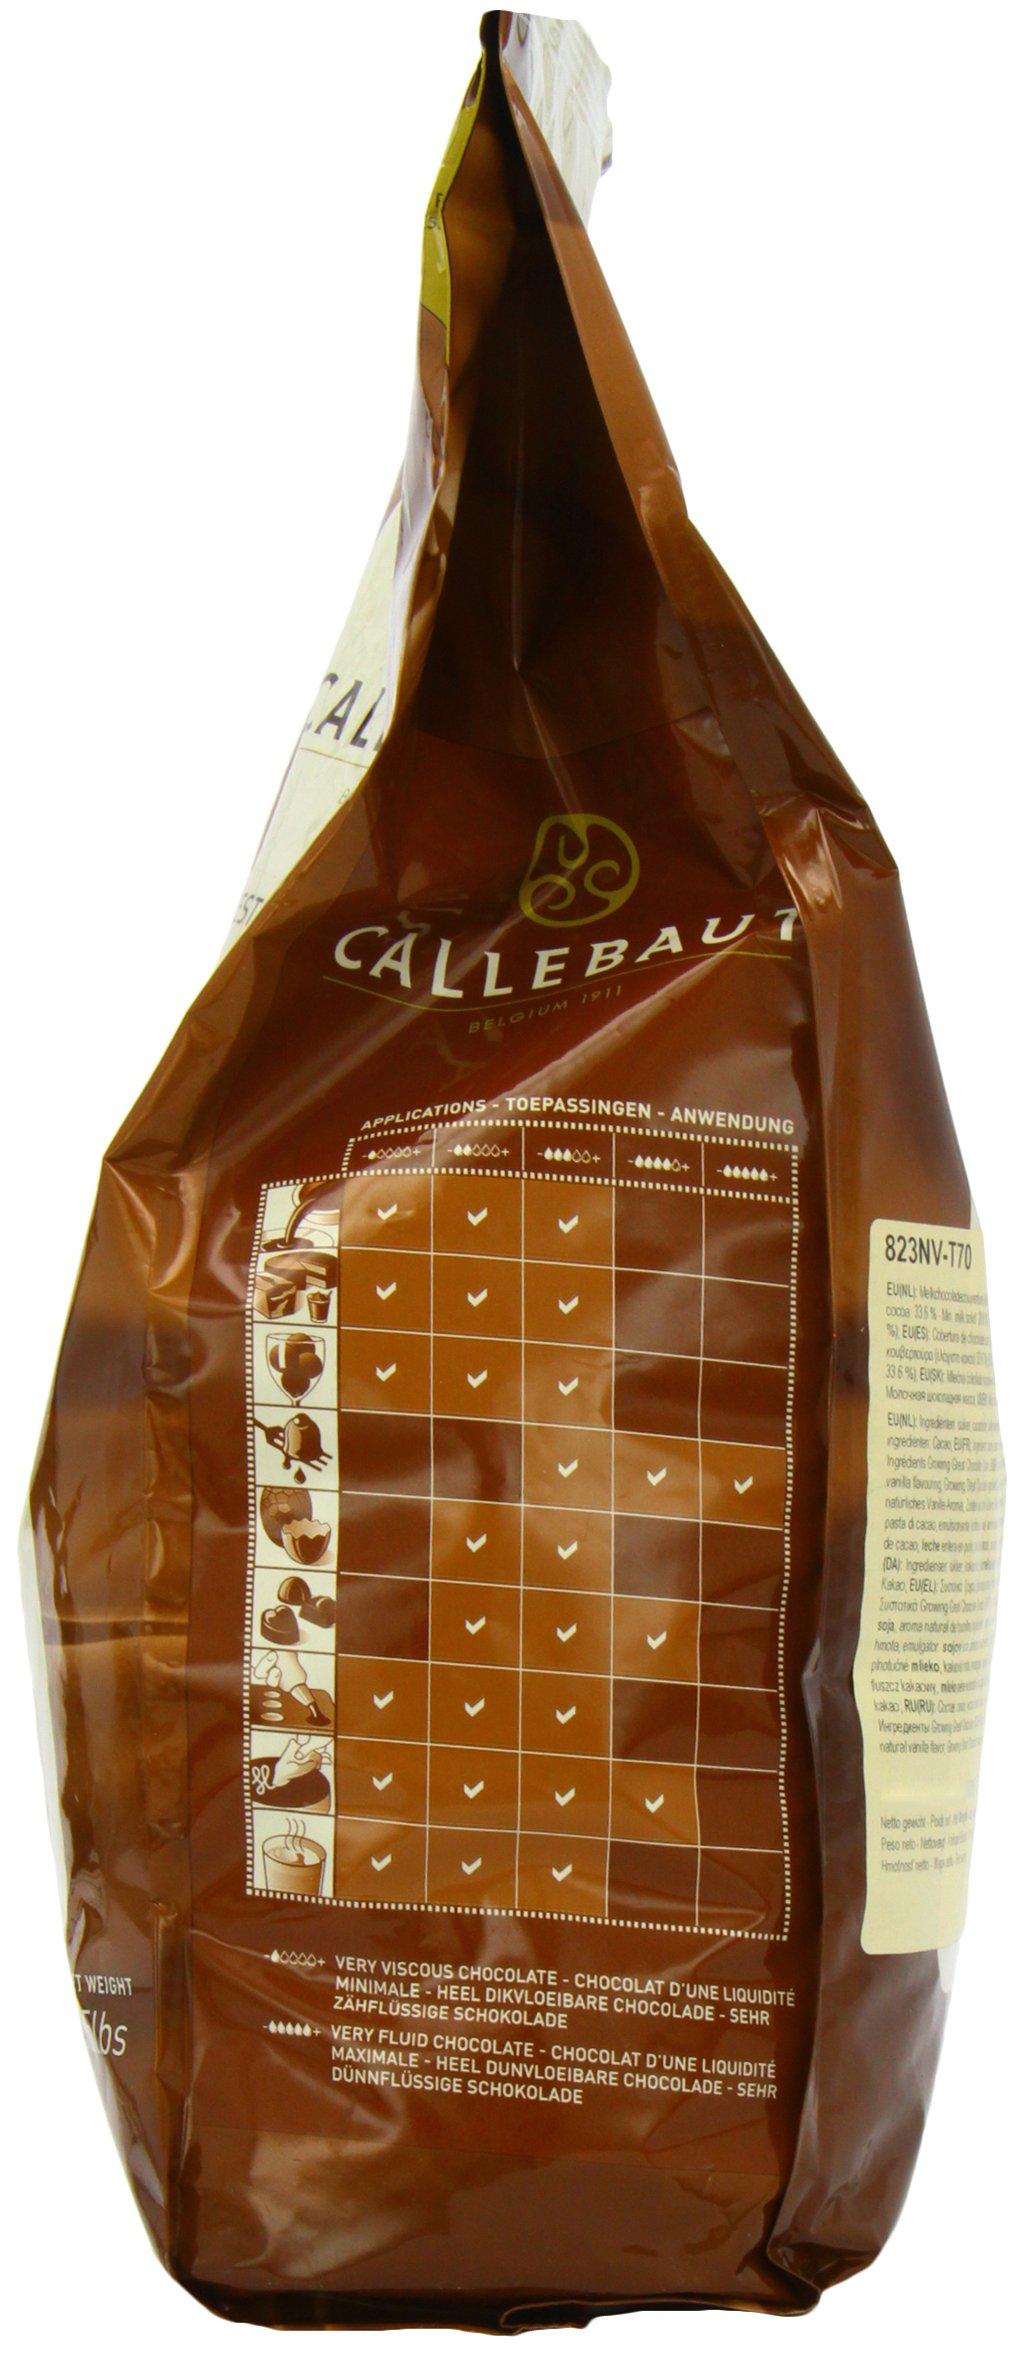 Belgian Milk Chocolate Baking Callets (Chips) - 33.6% - 1 bag, 5.5 lbs by Callebaut (Image #4)